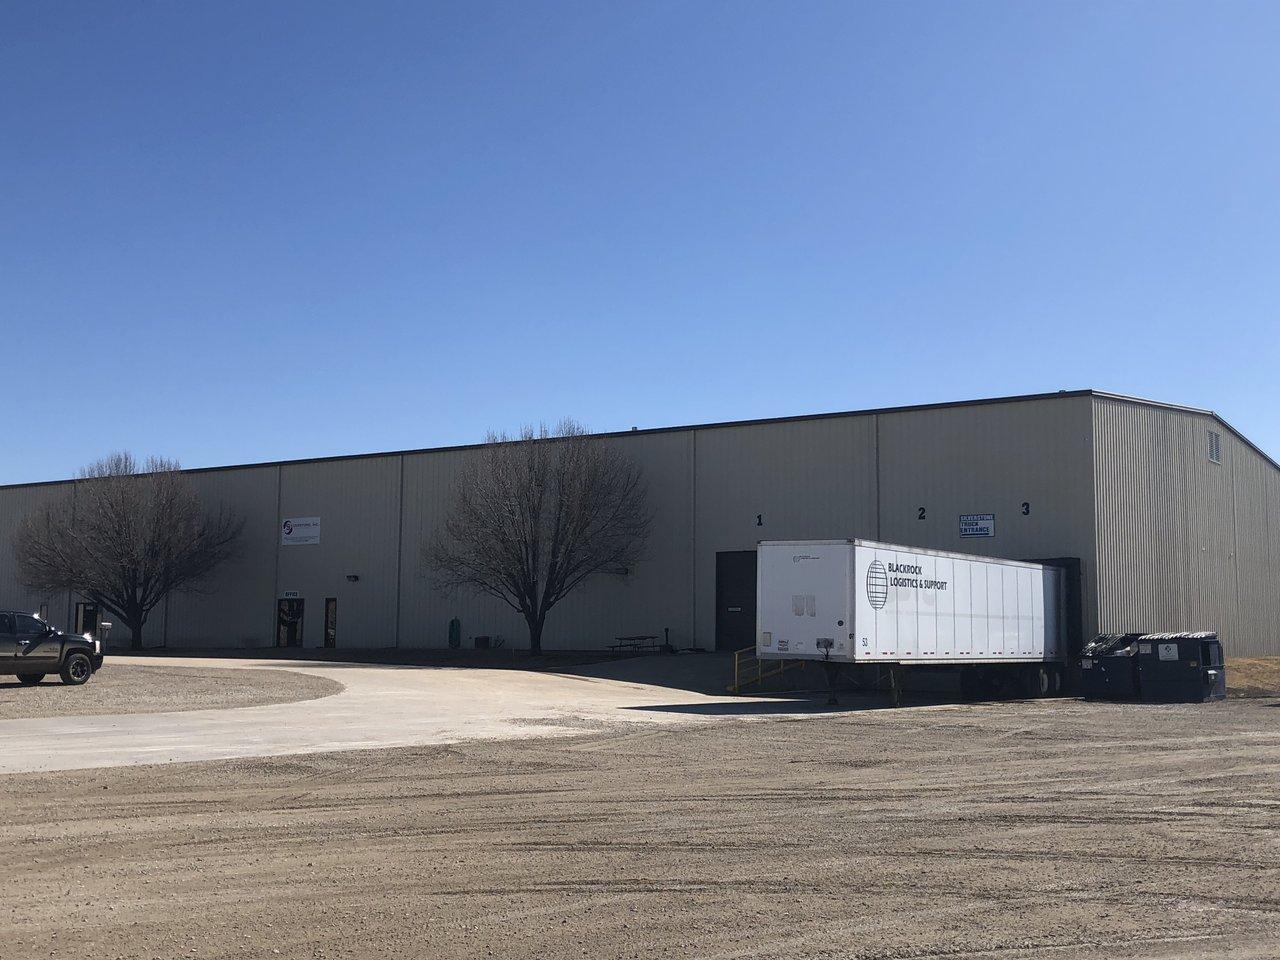 8515 N Hesston Rd, Hesston, KS, 67062